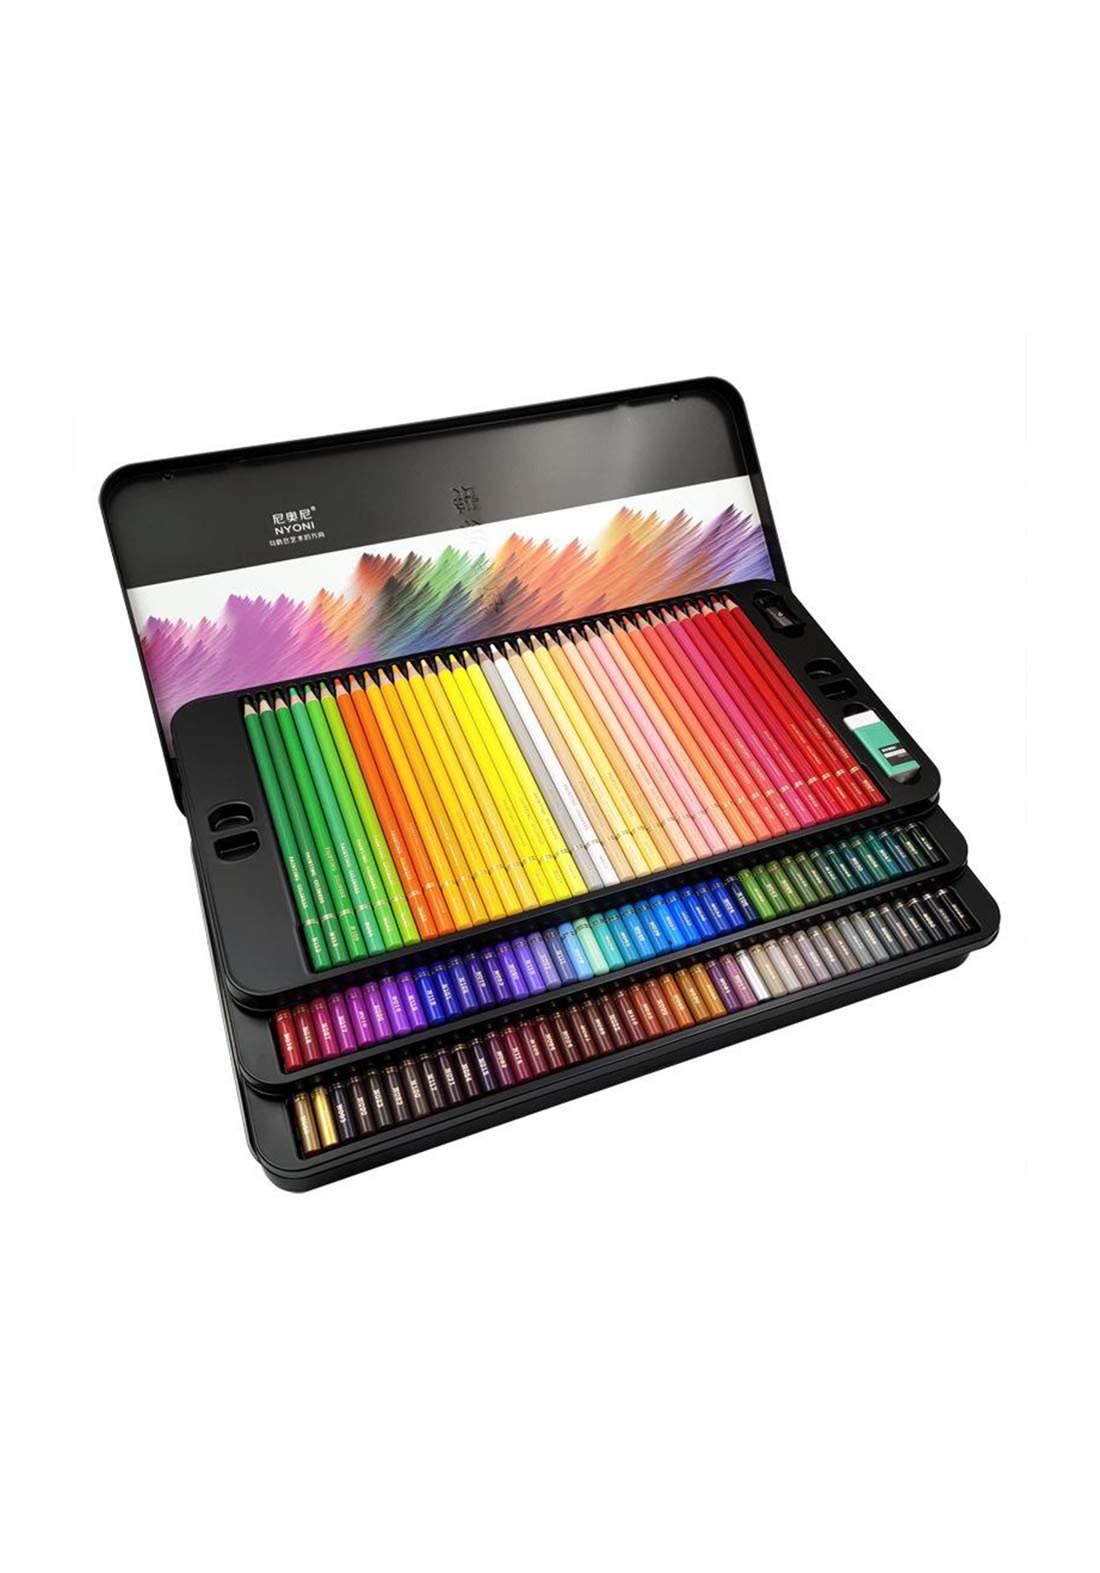 Nyoni Wood Colored Pencil Set 120Pcs اقلام تلوين خشبية